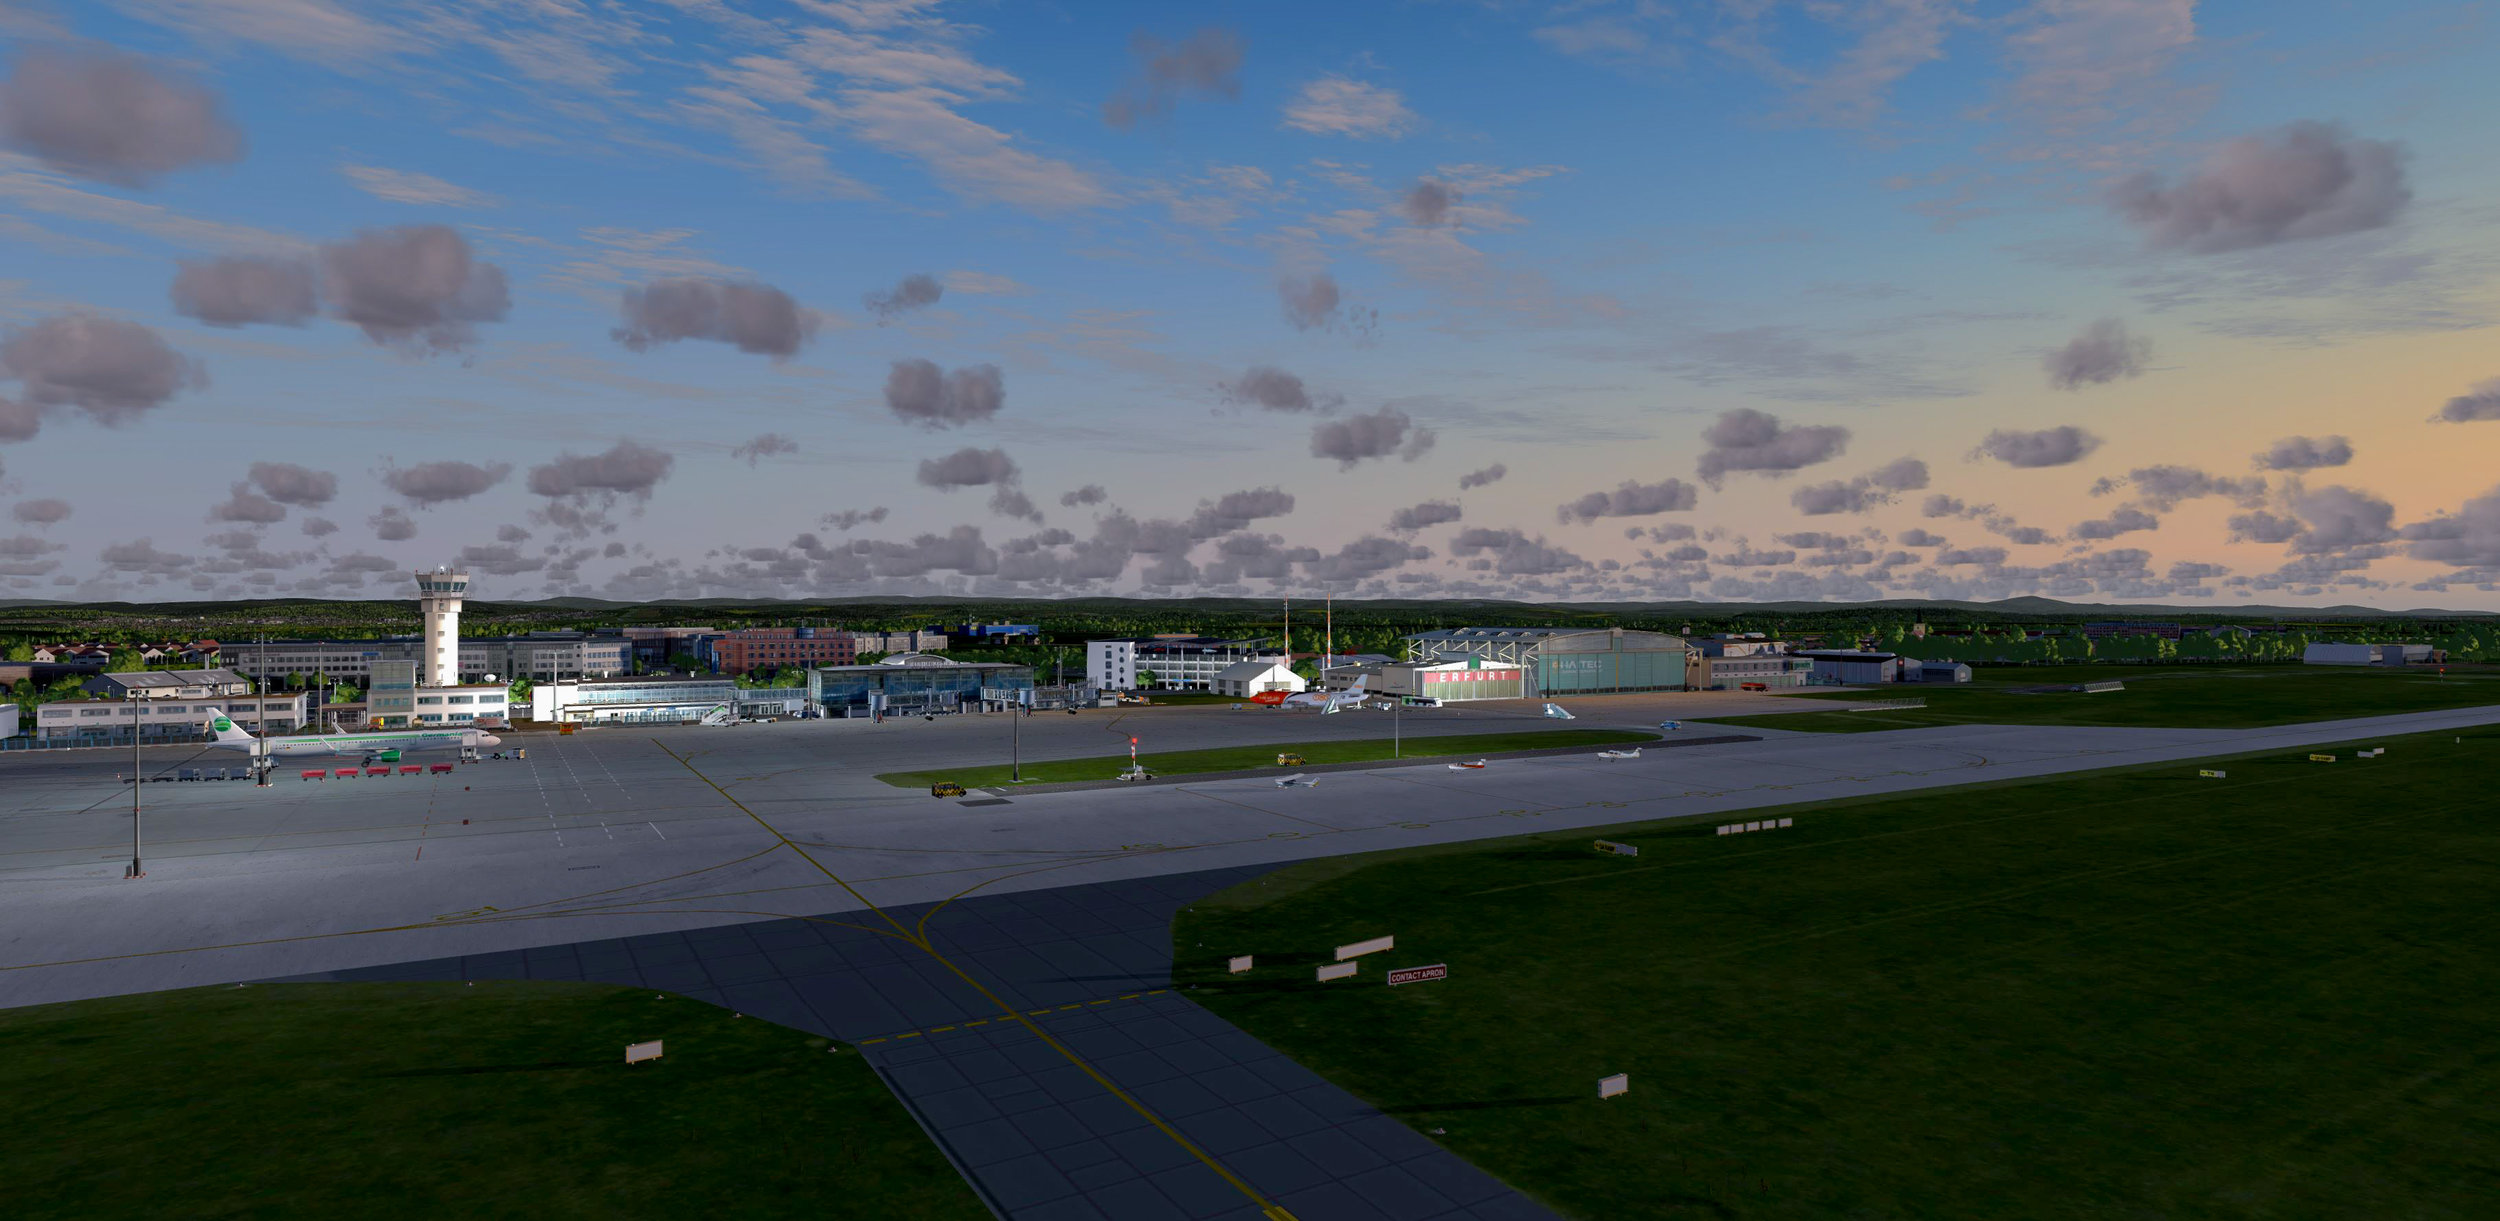 Airport_Erfurt_P3Dv4_07.jpg